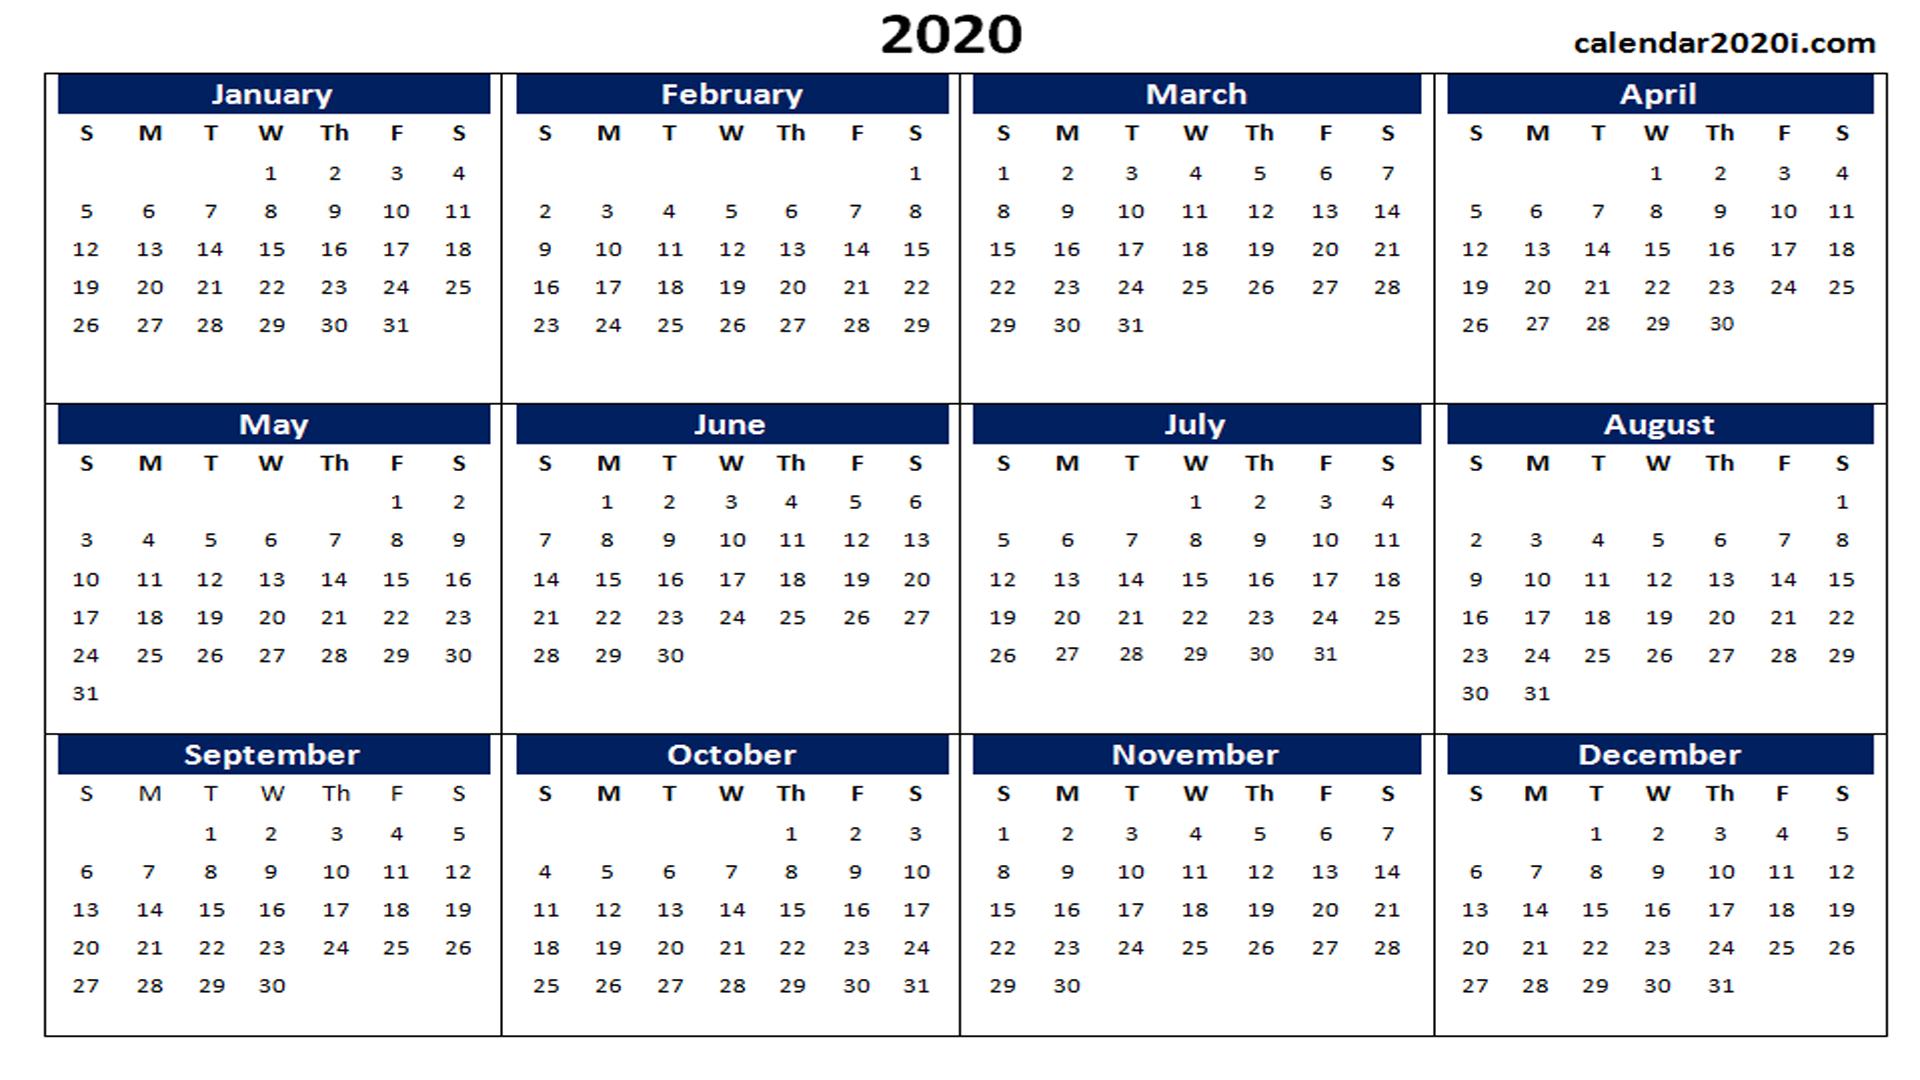 Blank 2020 Calendar Printable Templates | Calendar 2020 with 2020 Etited Calendar